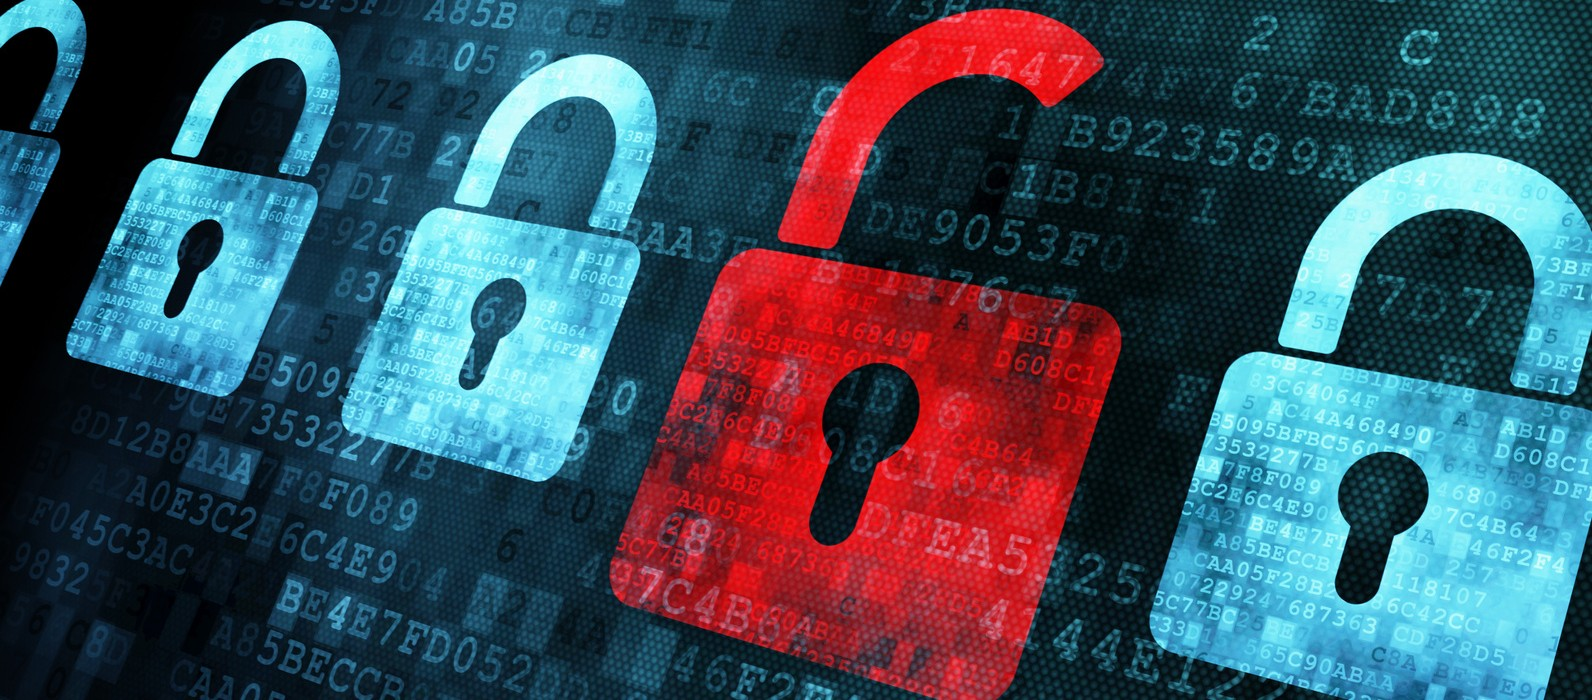 AVG privacywet